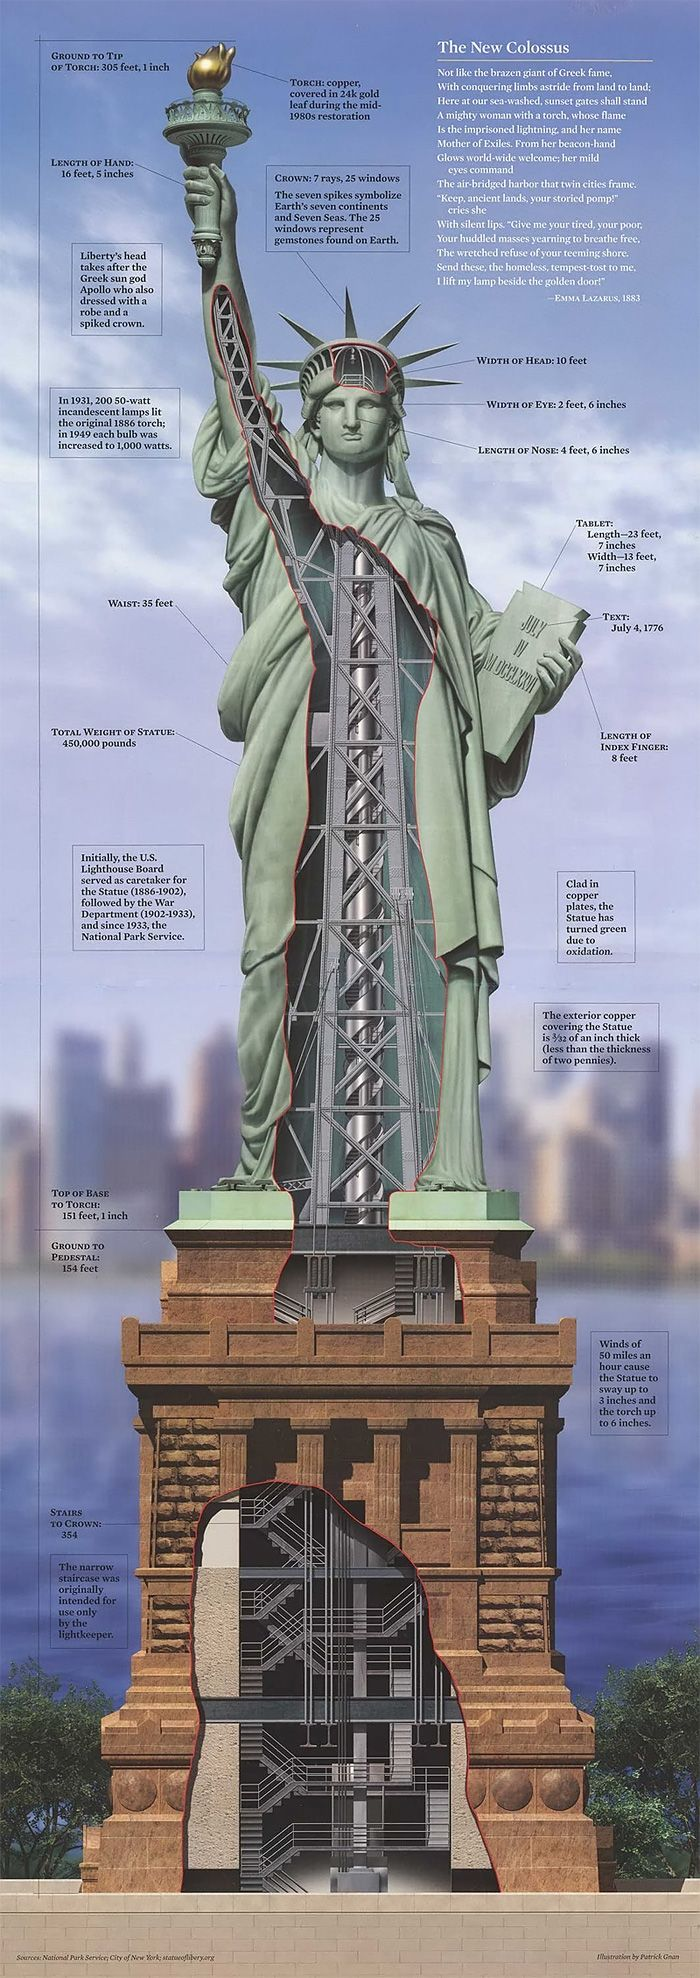 des d tails de l 39 int rieur de la statue of liberty new york city new york city pinterest. Black Bedroom Furniture Sets. Home Design Ideas